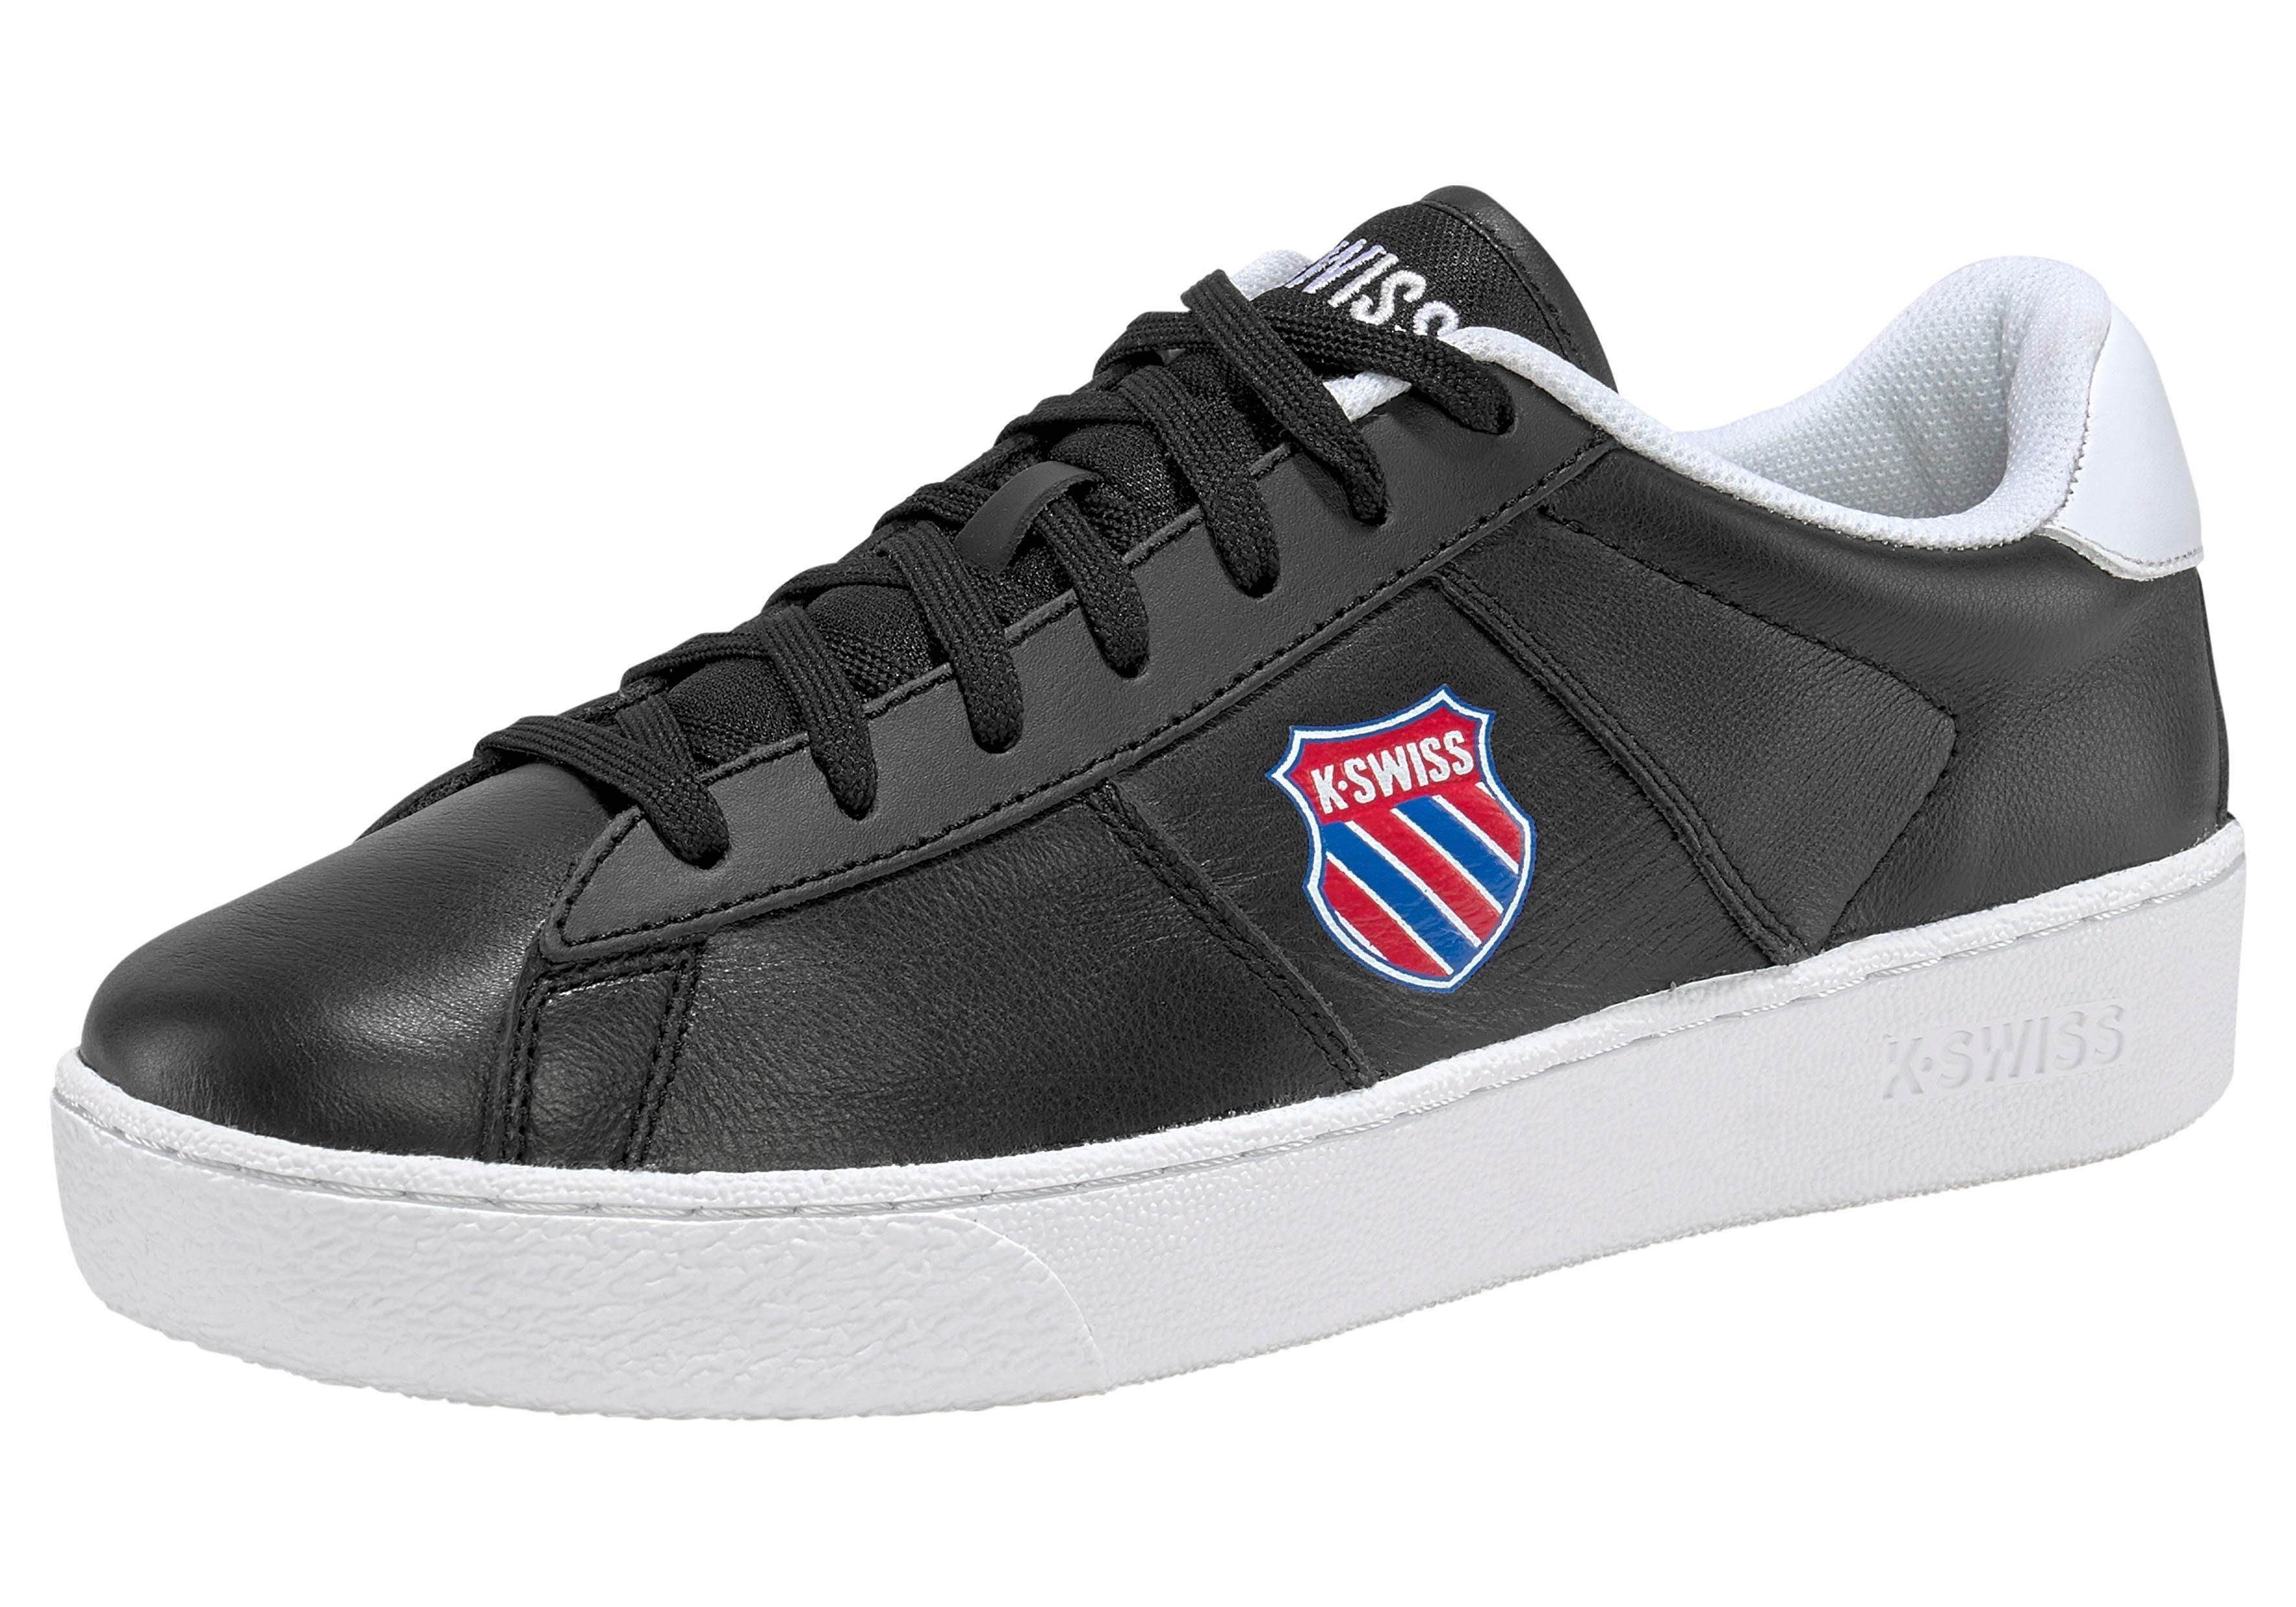 sneakers »Court Casal P«